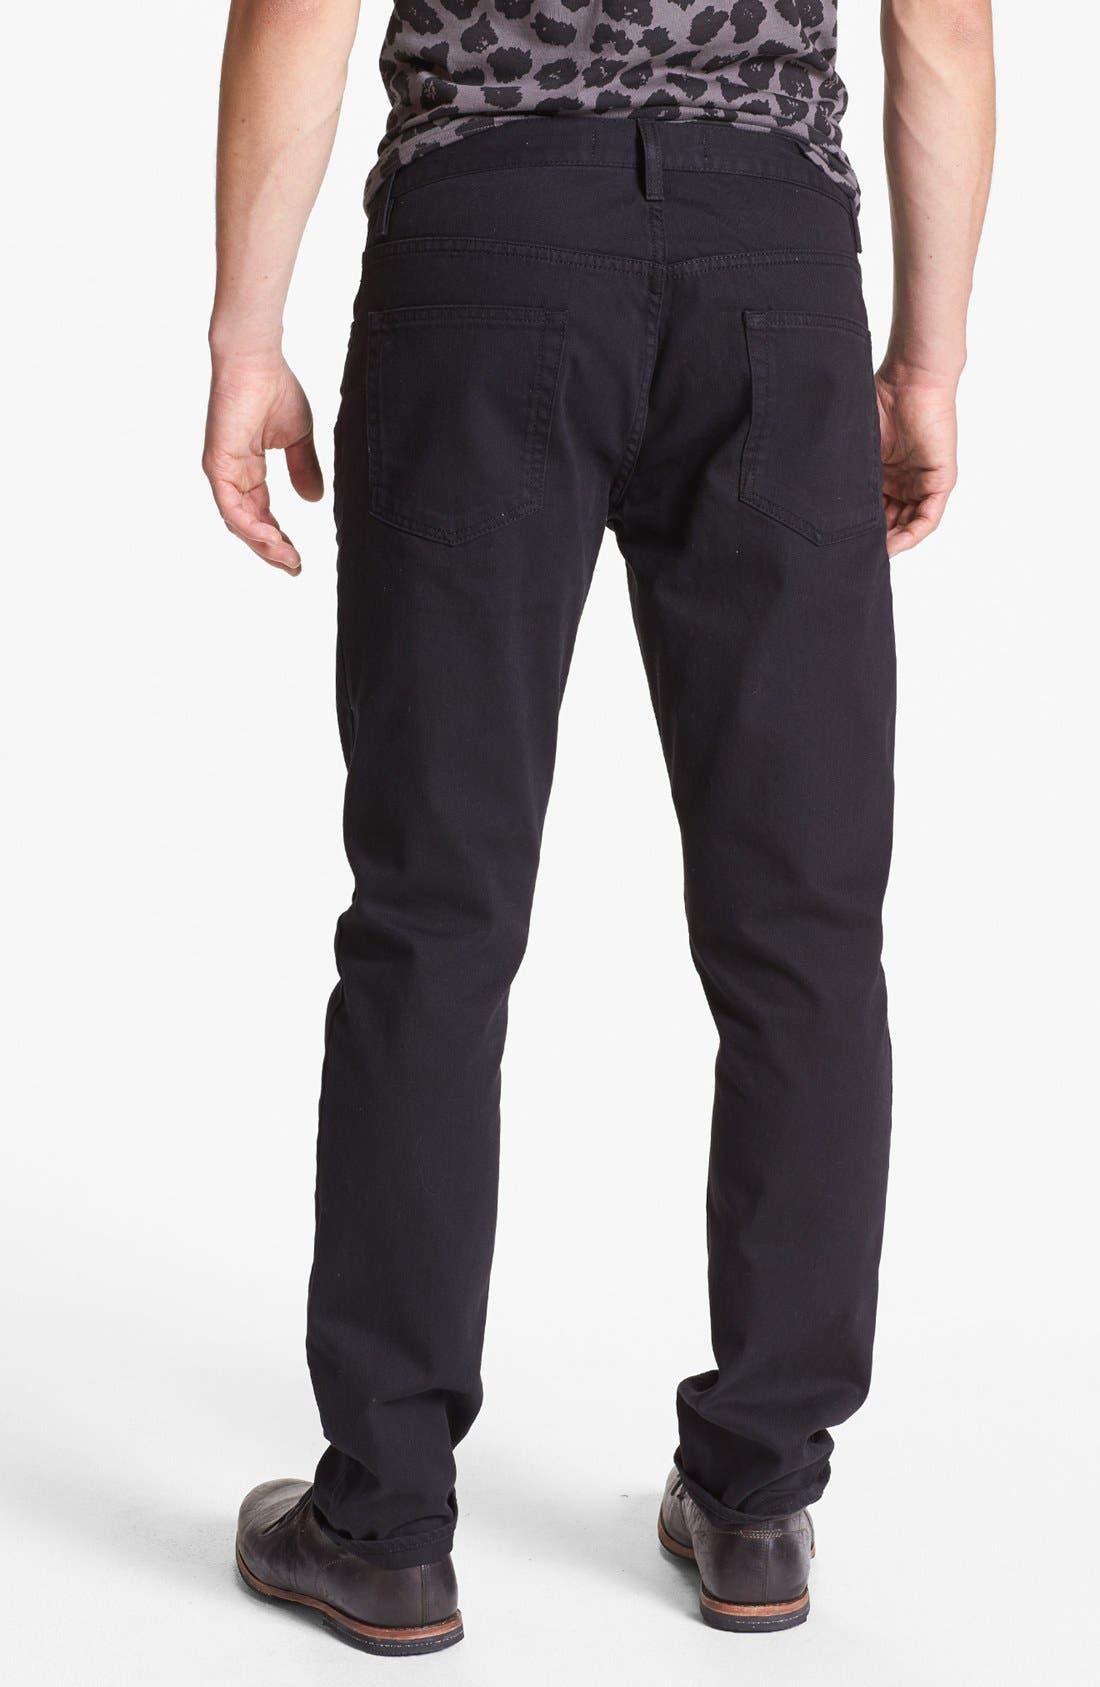 Alternate Image 1 Selected - Topman Slim Fit Jeans (Black)